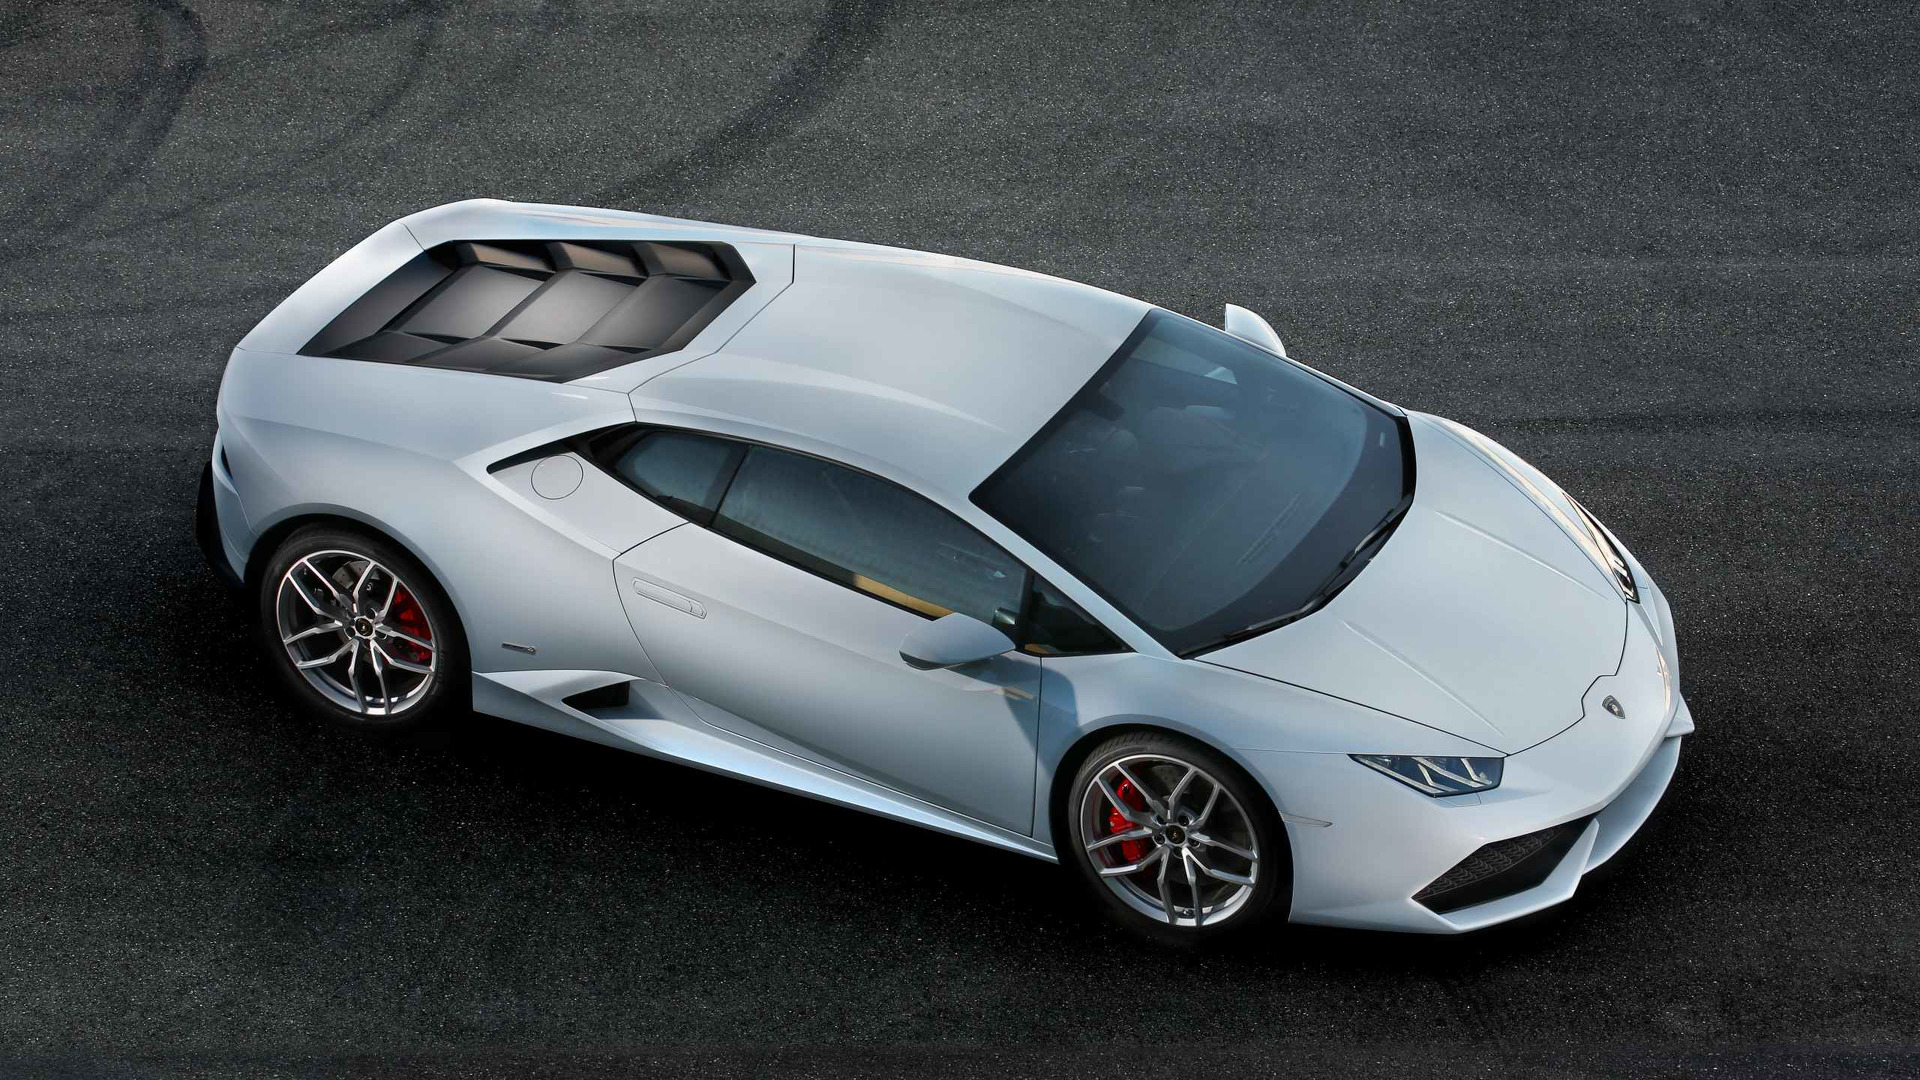 Lamborghini Huracan Could Get Rear Wheel Steering In 2019 Update